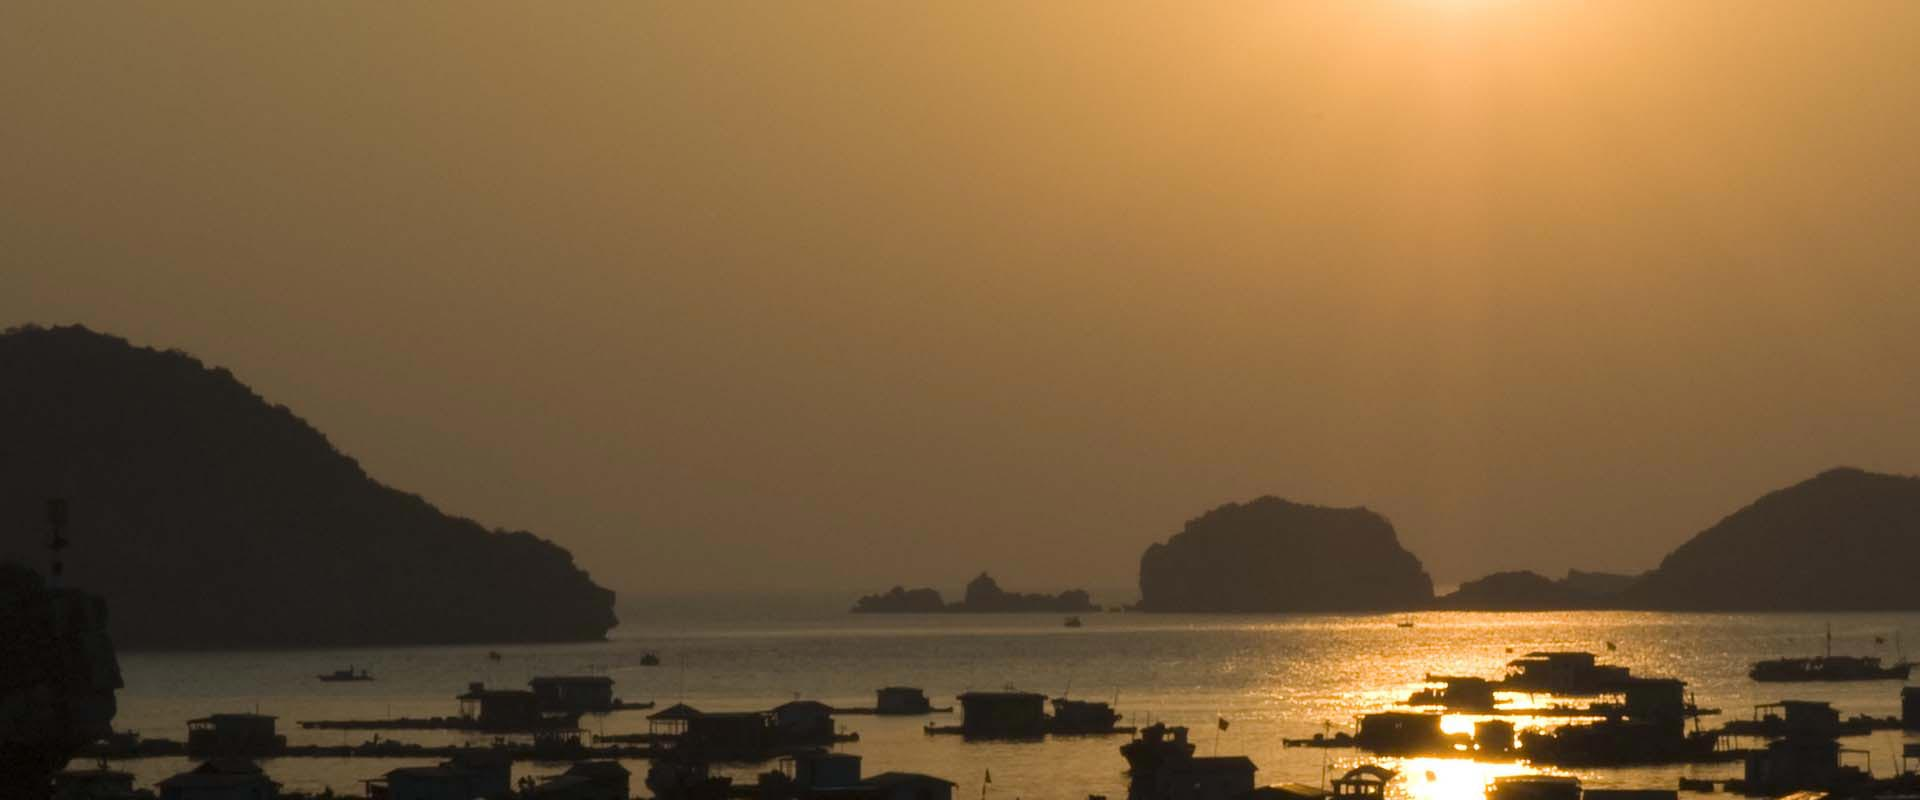 Vietnam Public Holidays 2021 Publicholidays Vn